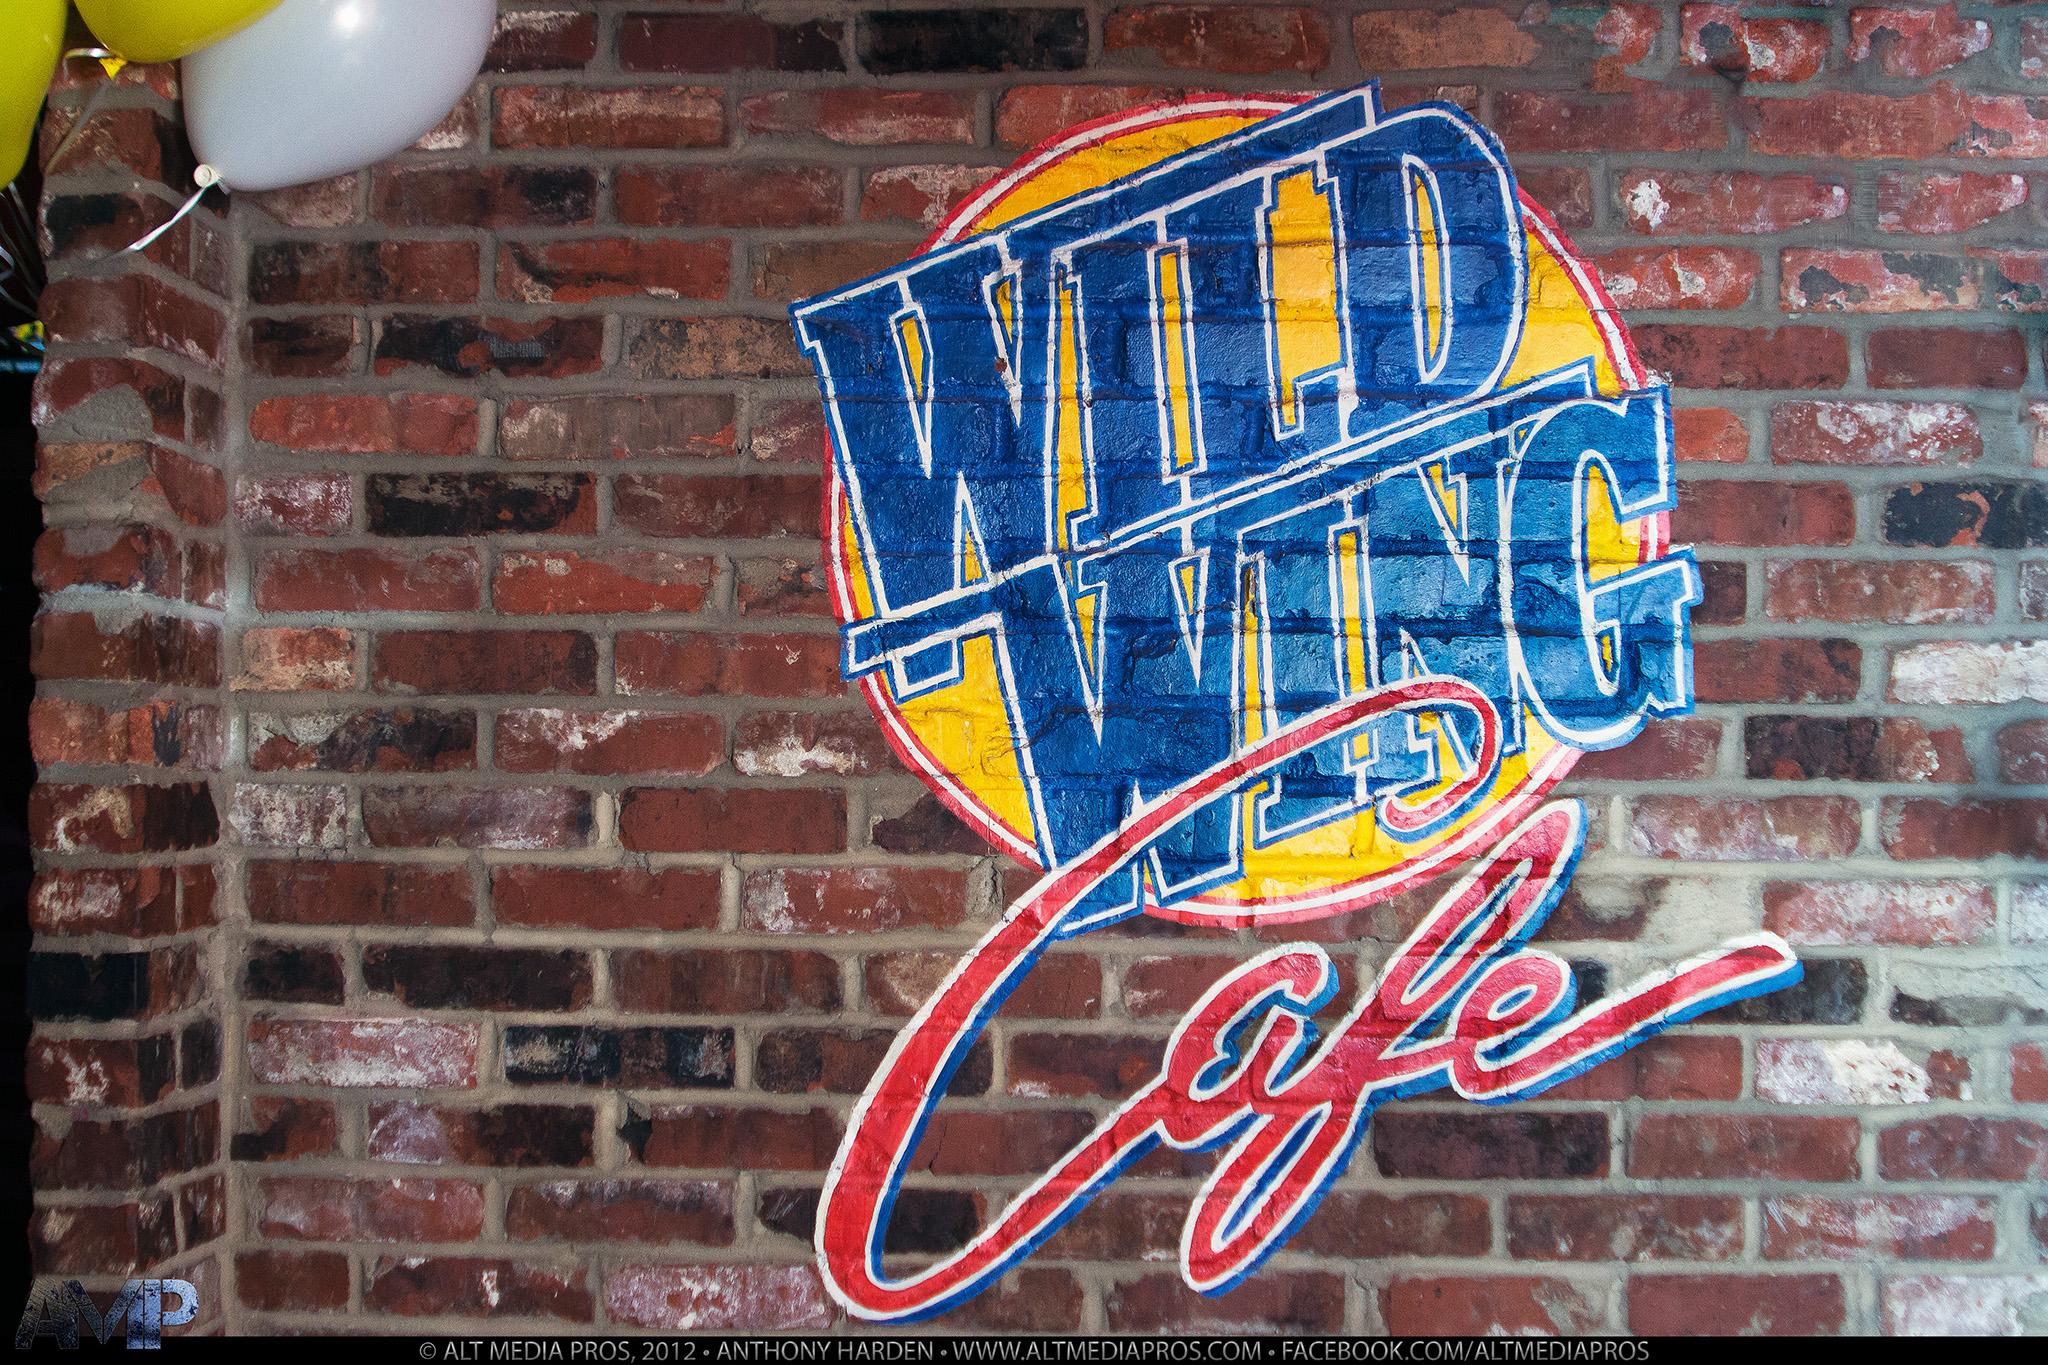 Wild Wing Cafe_AMP_123112_007.jpg